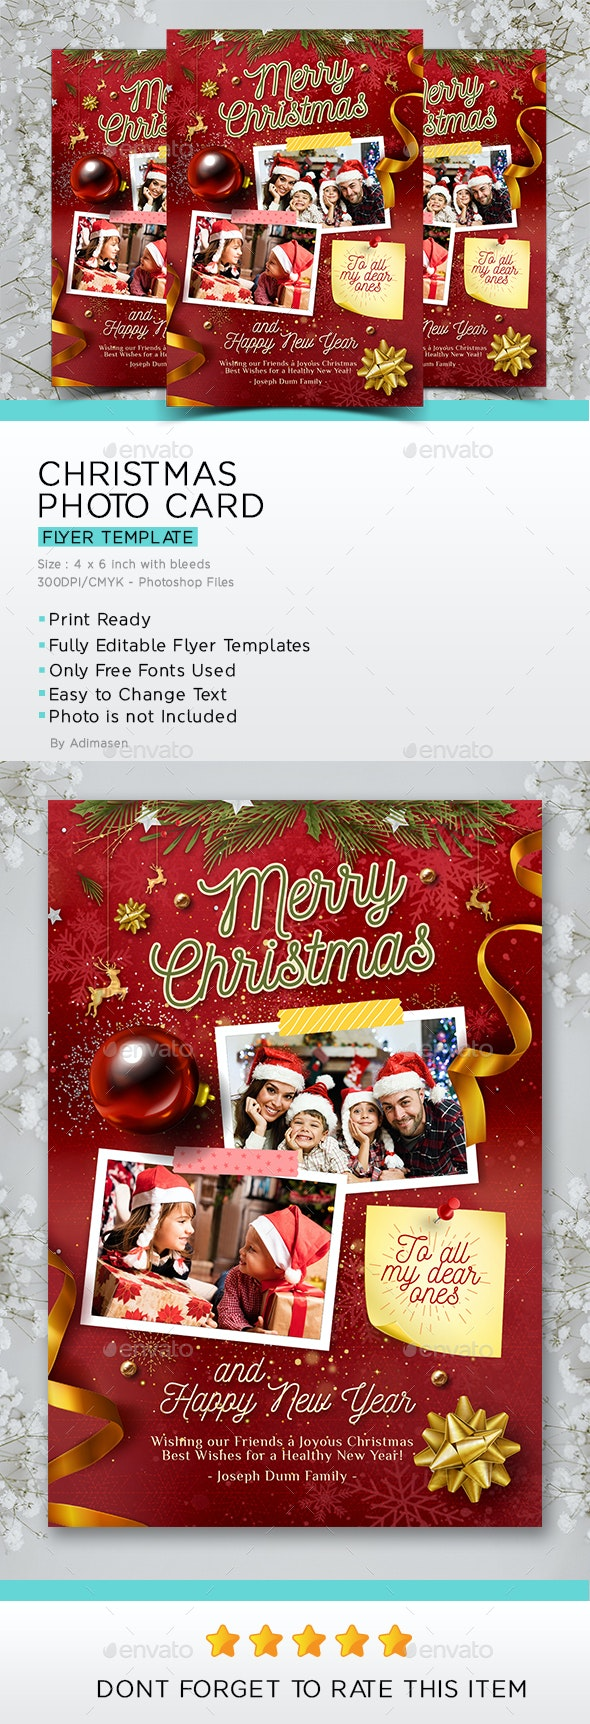 Christmas Photo Card Template - Christmas Greeting Cards